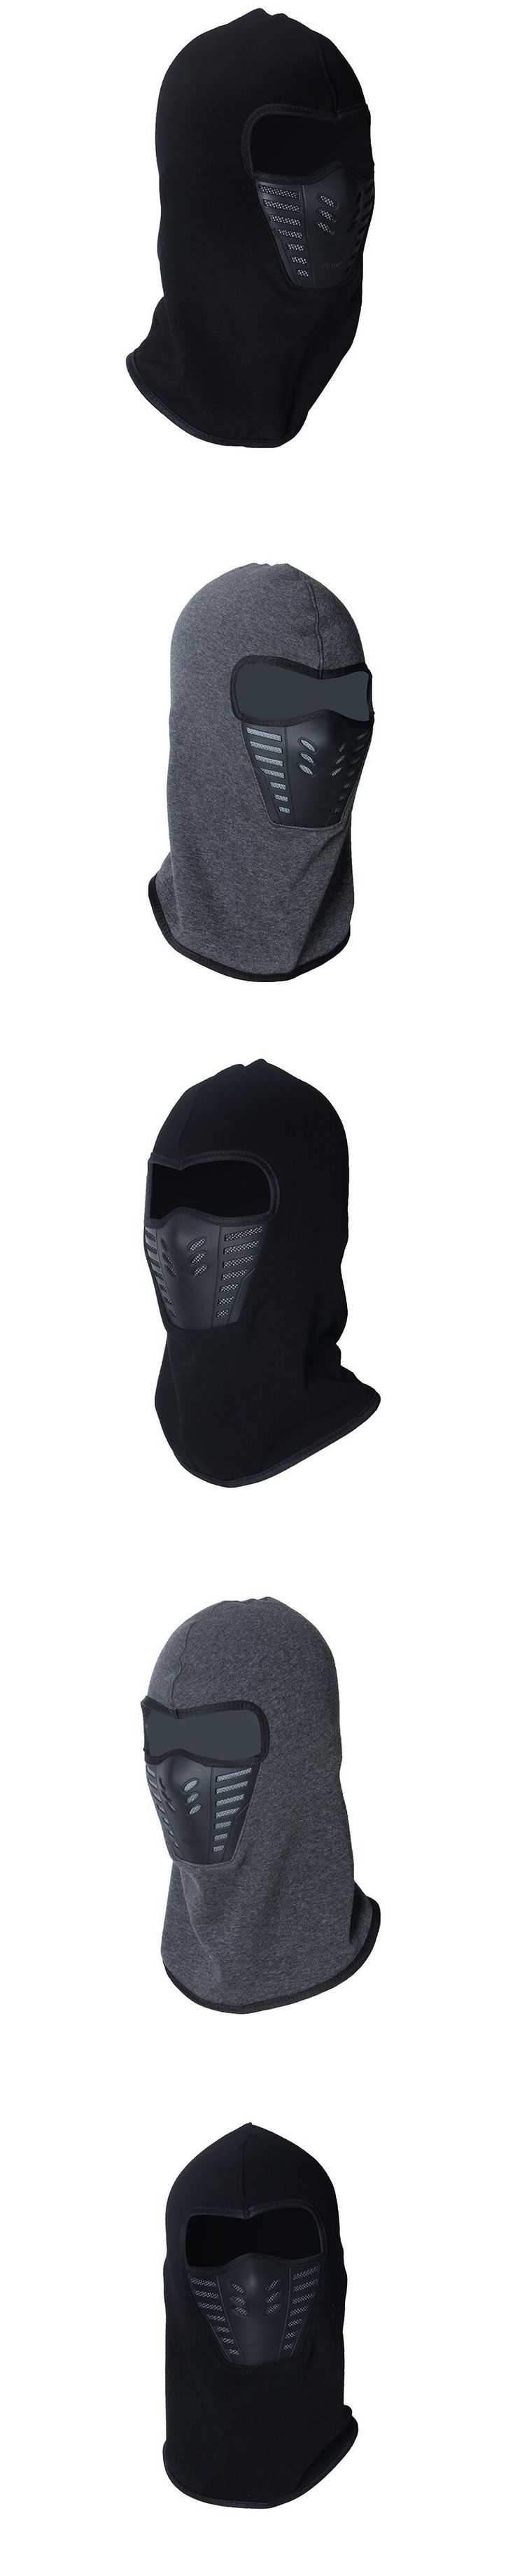 Winter warm Fleece beanies hats for men skull bandana neck warmer balaclava face mask Wargame Special Forces Mask